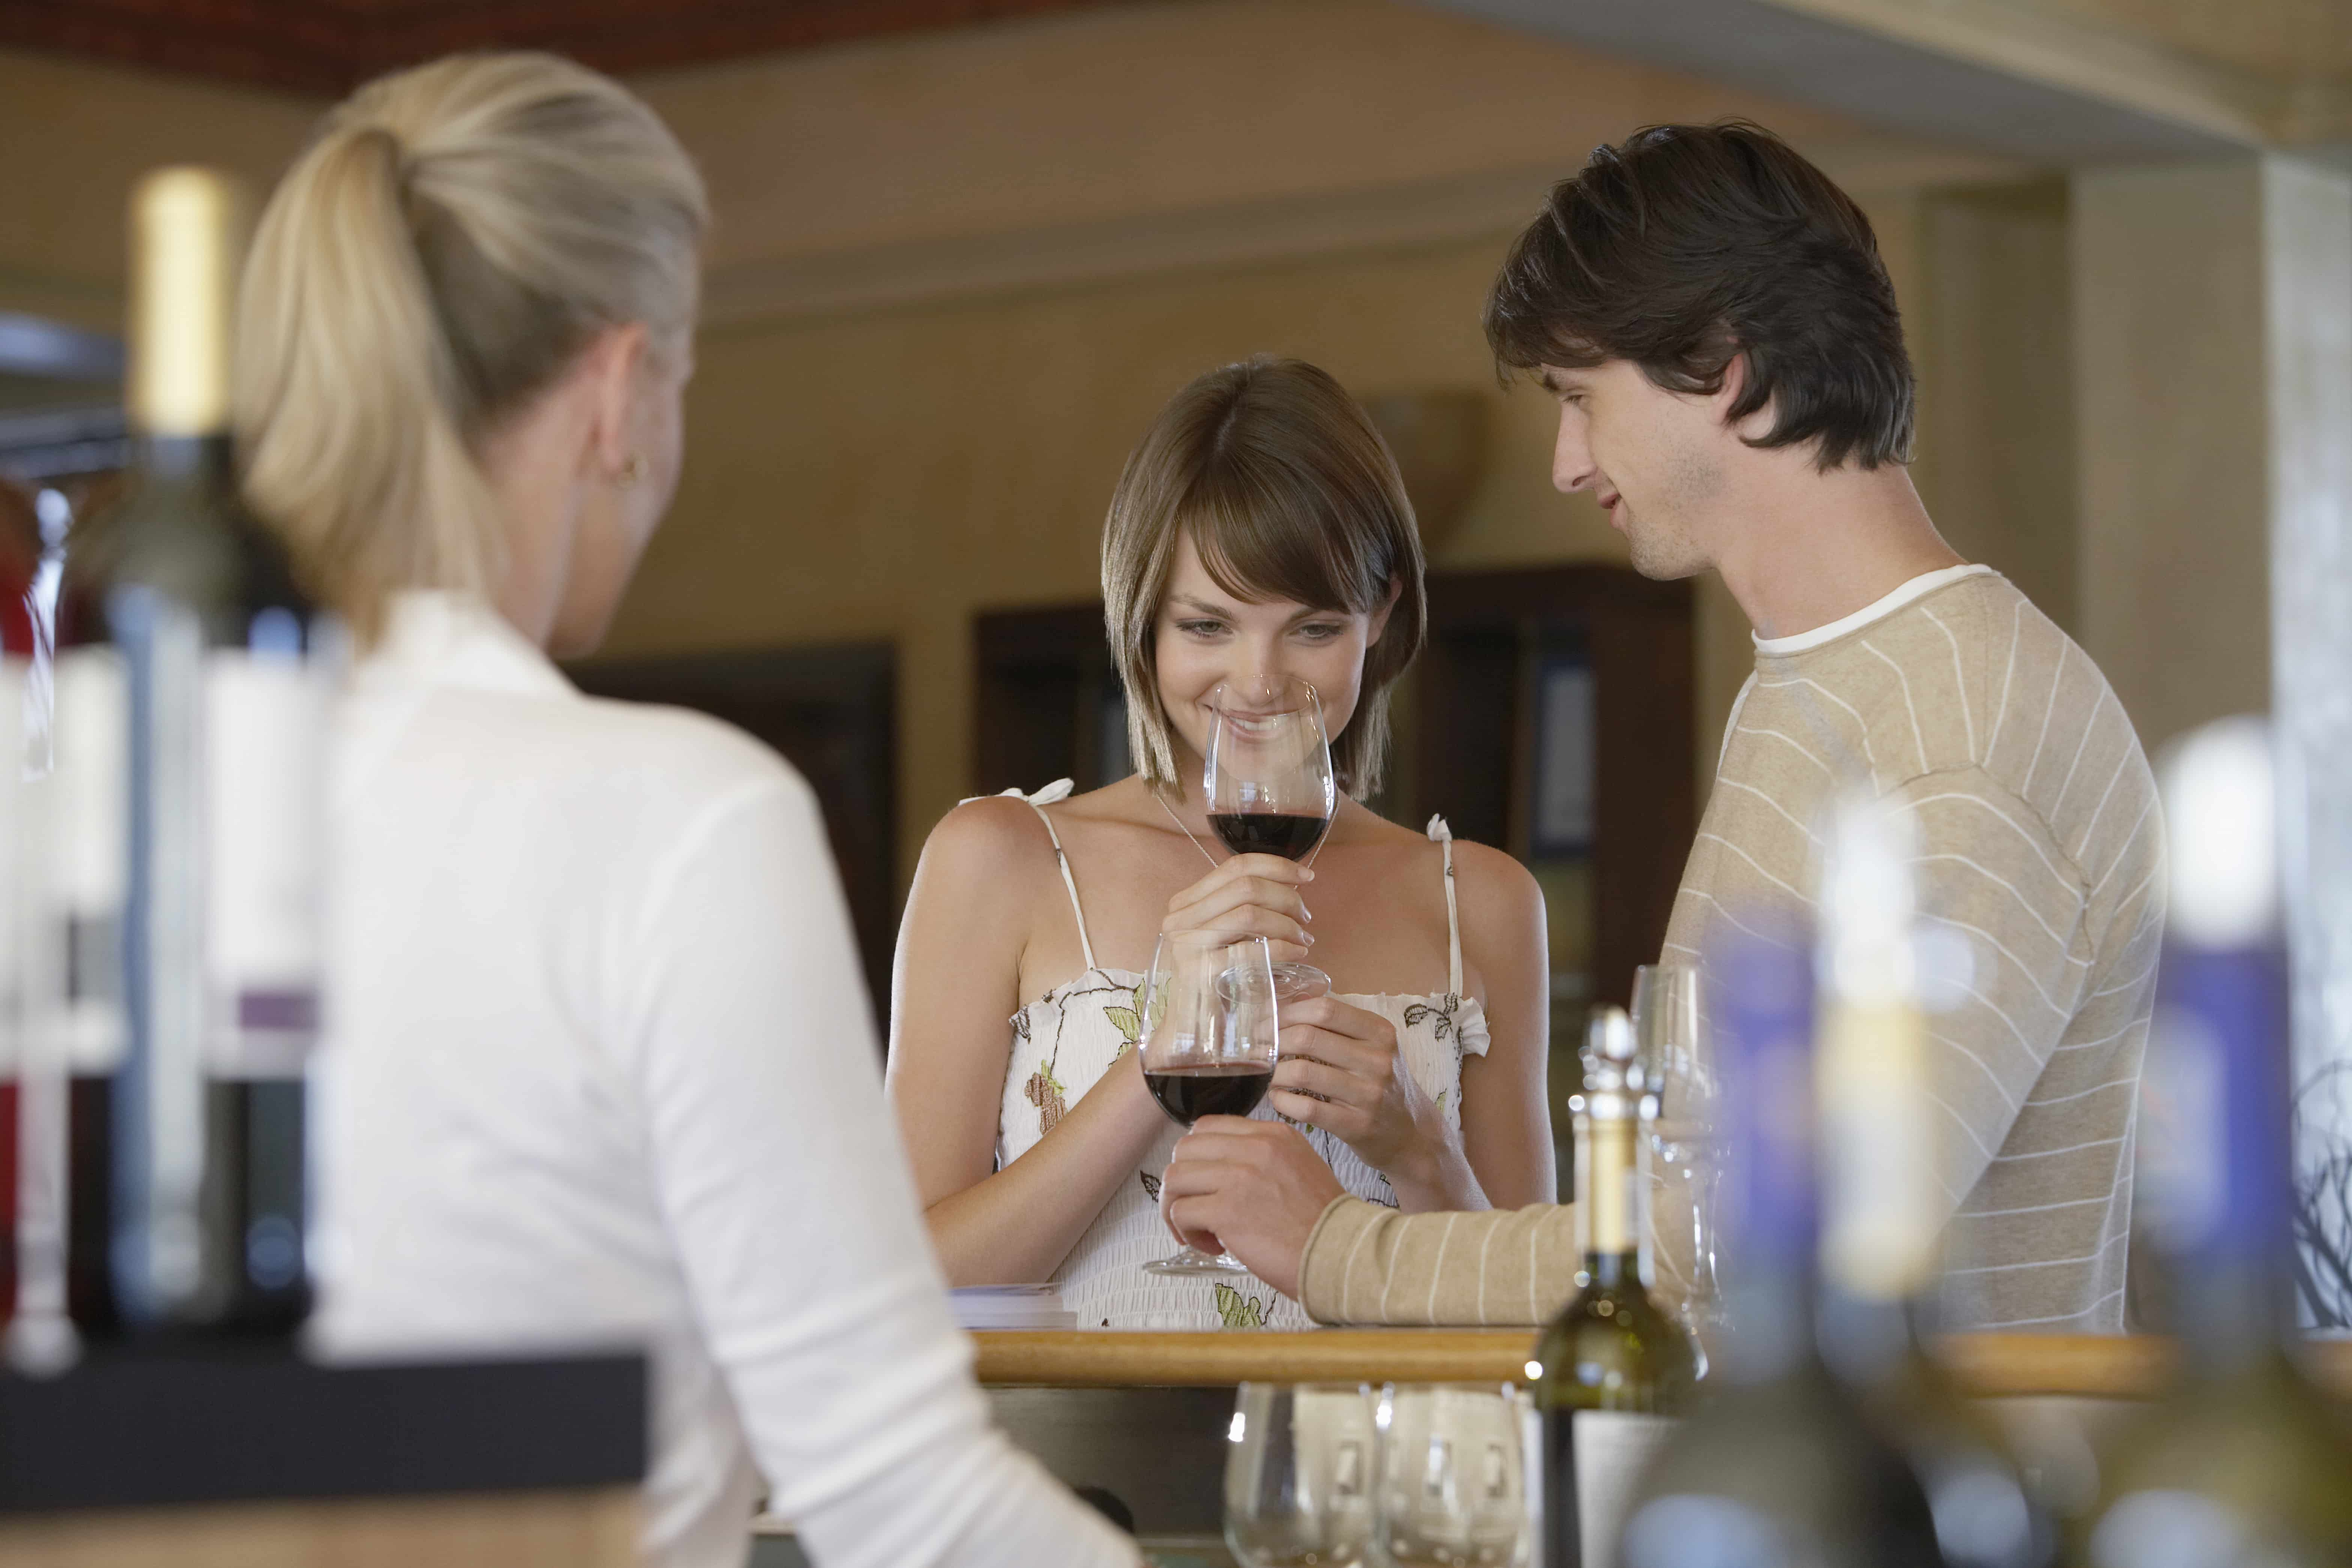 Couple winetasting